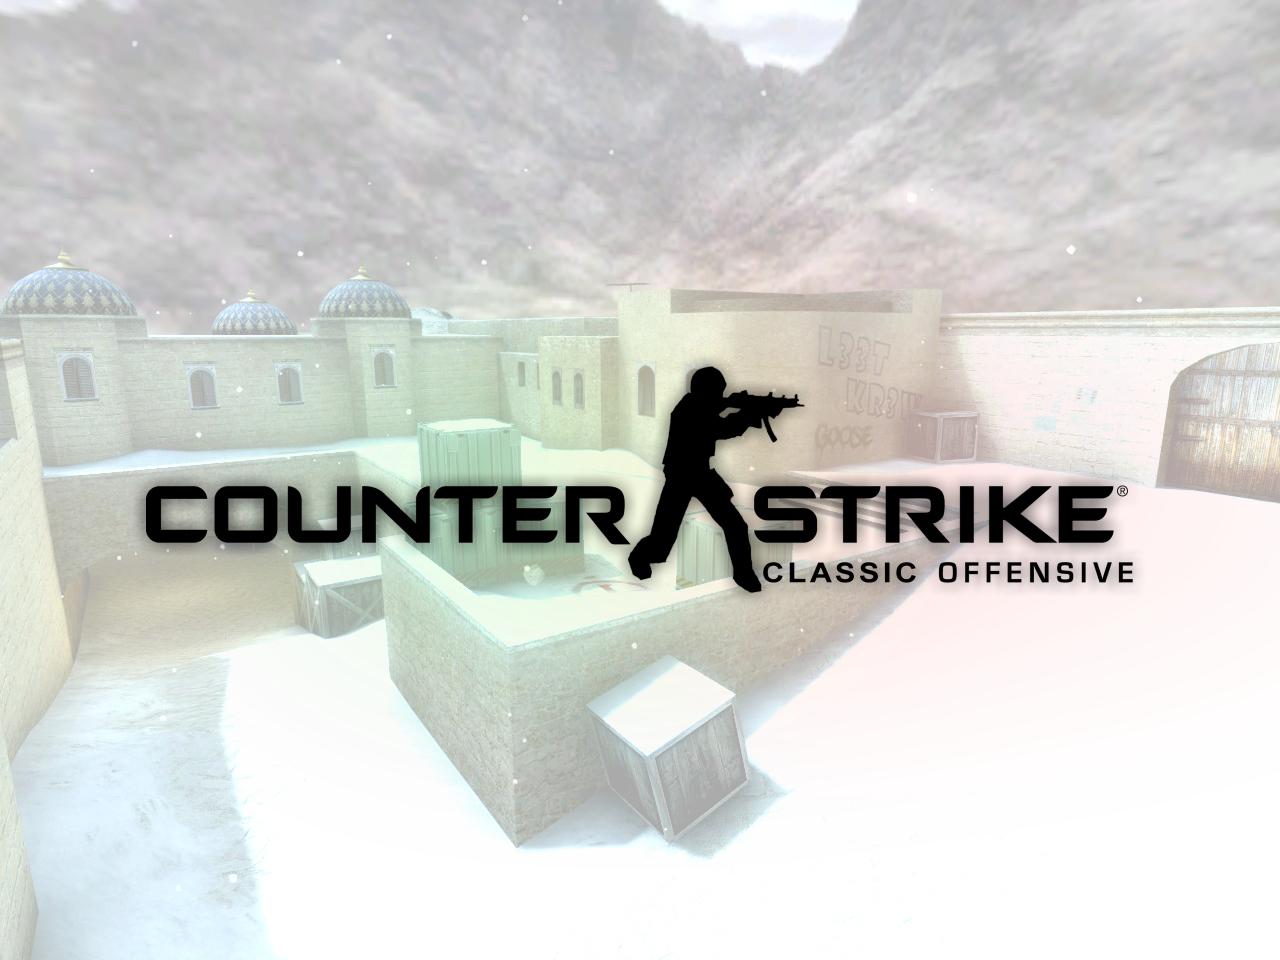 Counter strike global offensive blood mod читы на дроп оружия в кс го